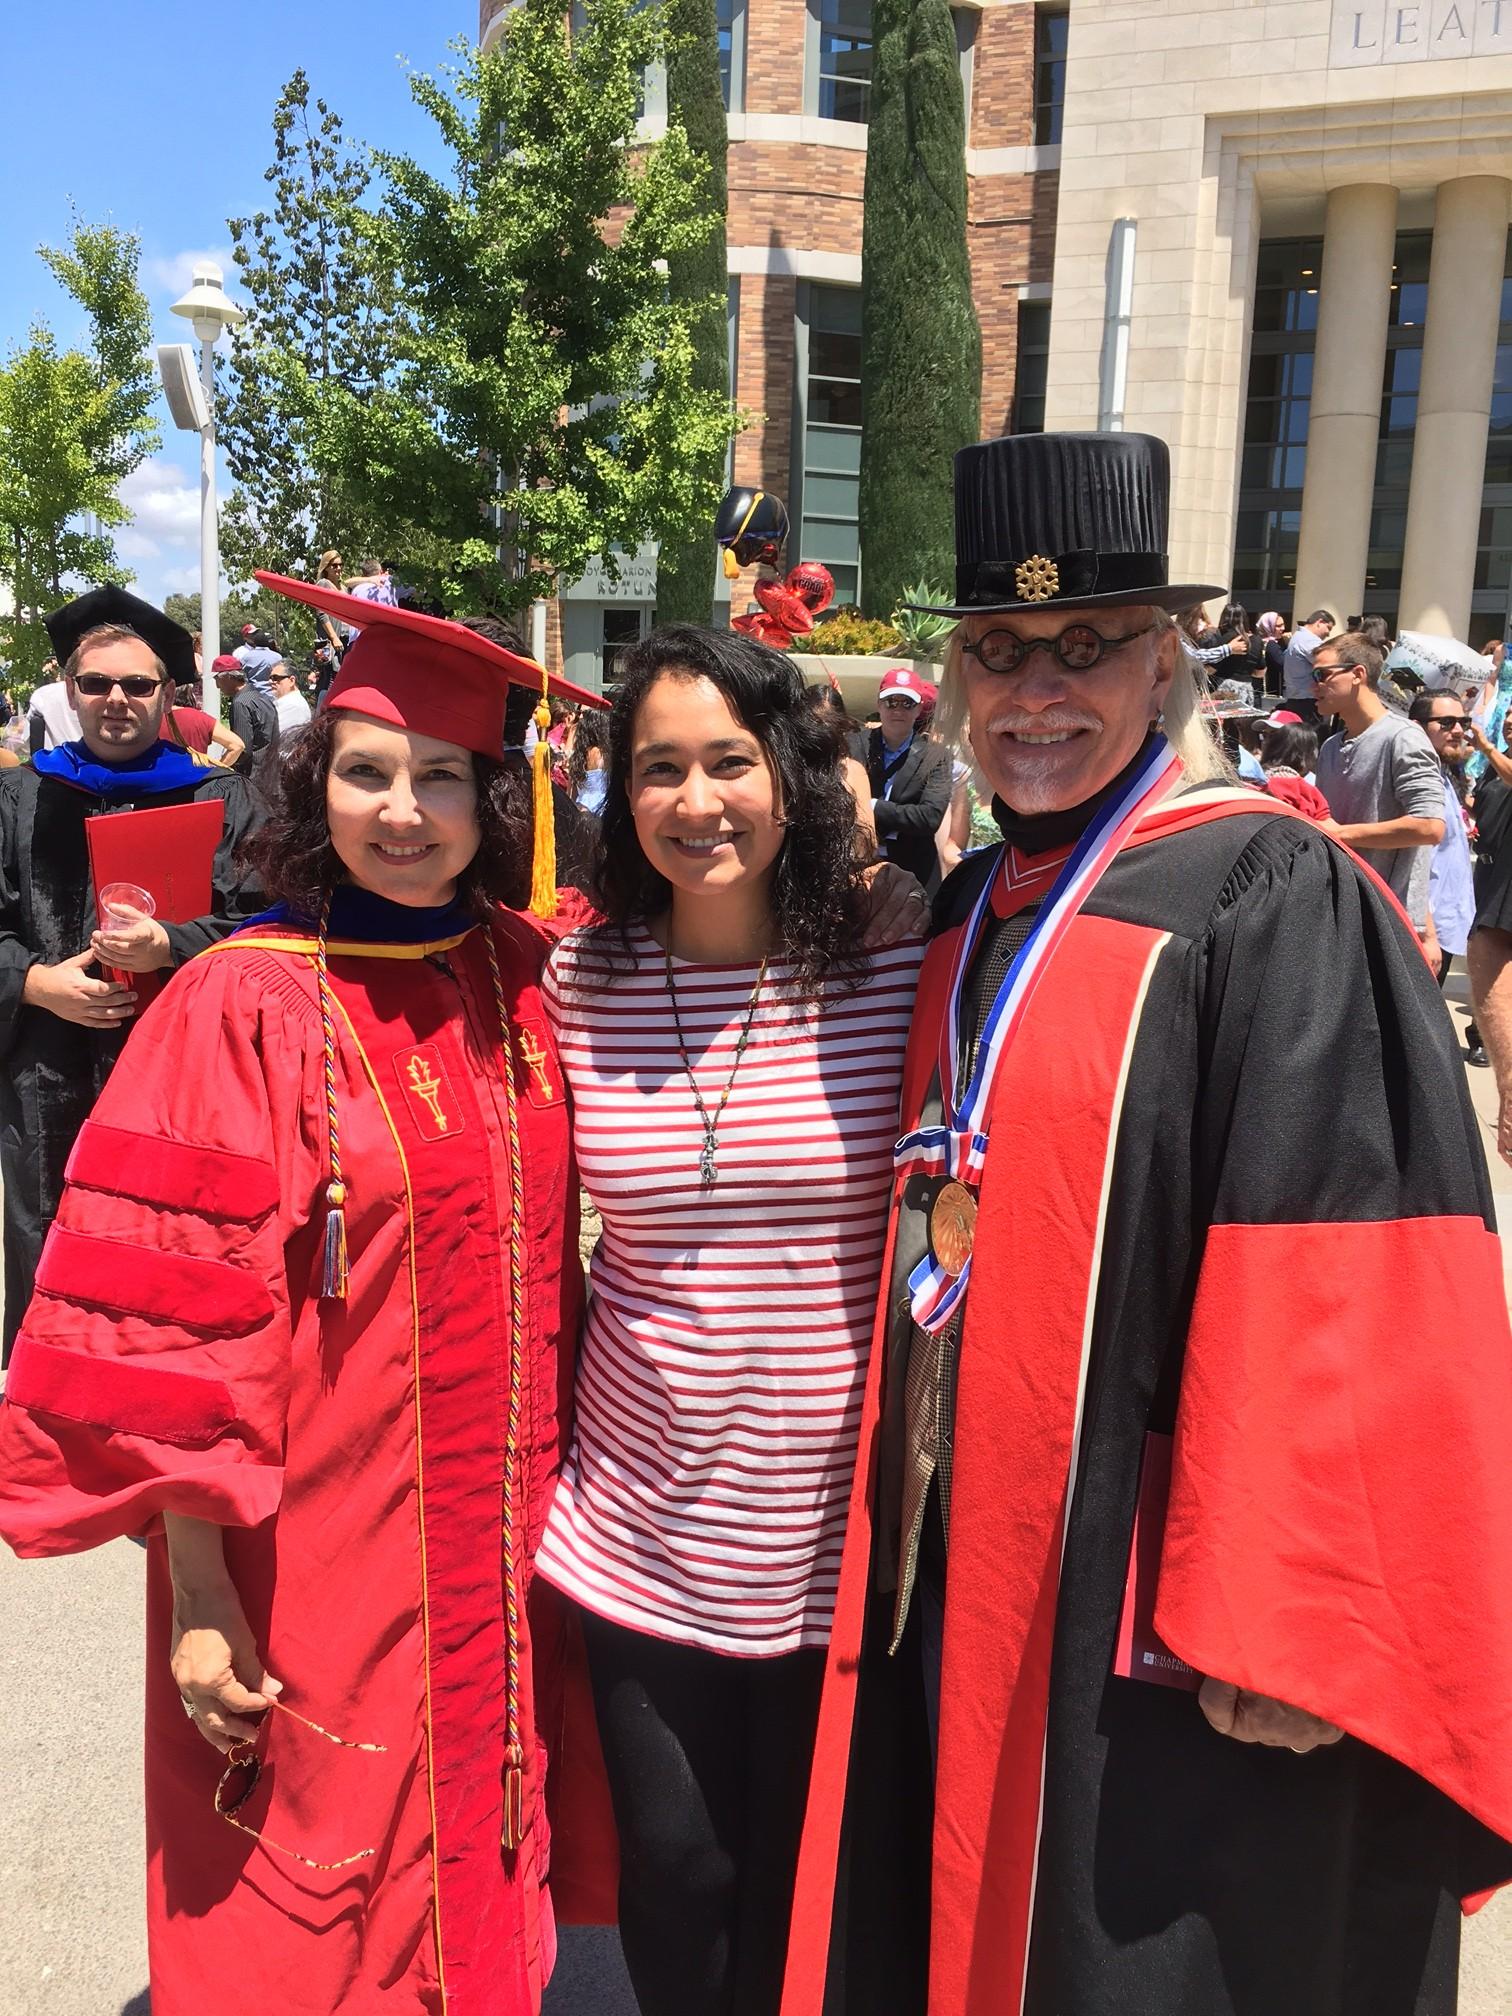 2016 Chapman University Graduation with Fatima and Lilia